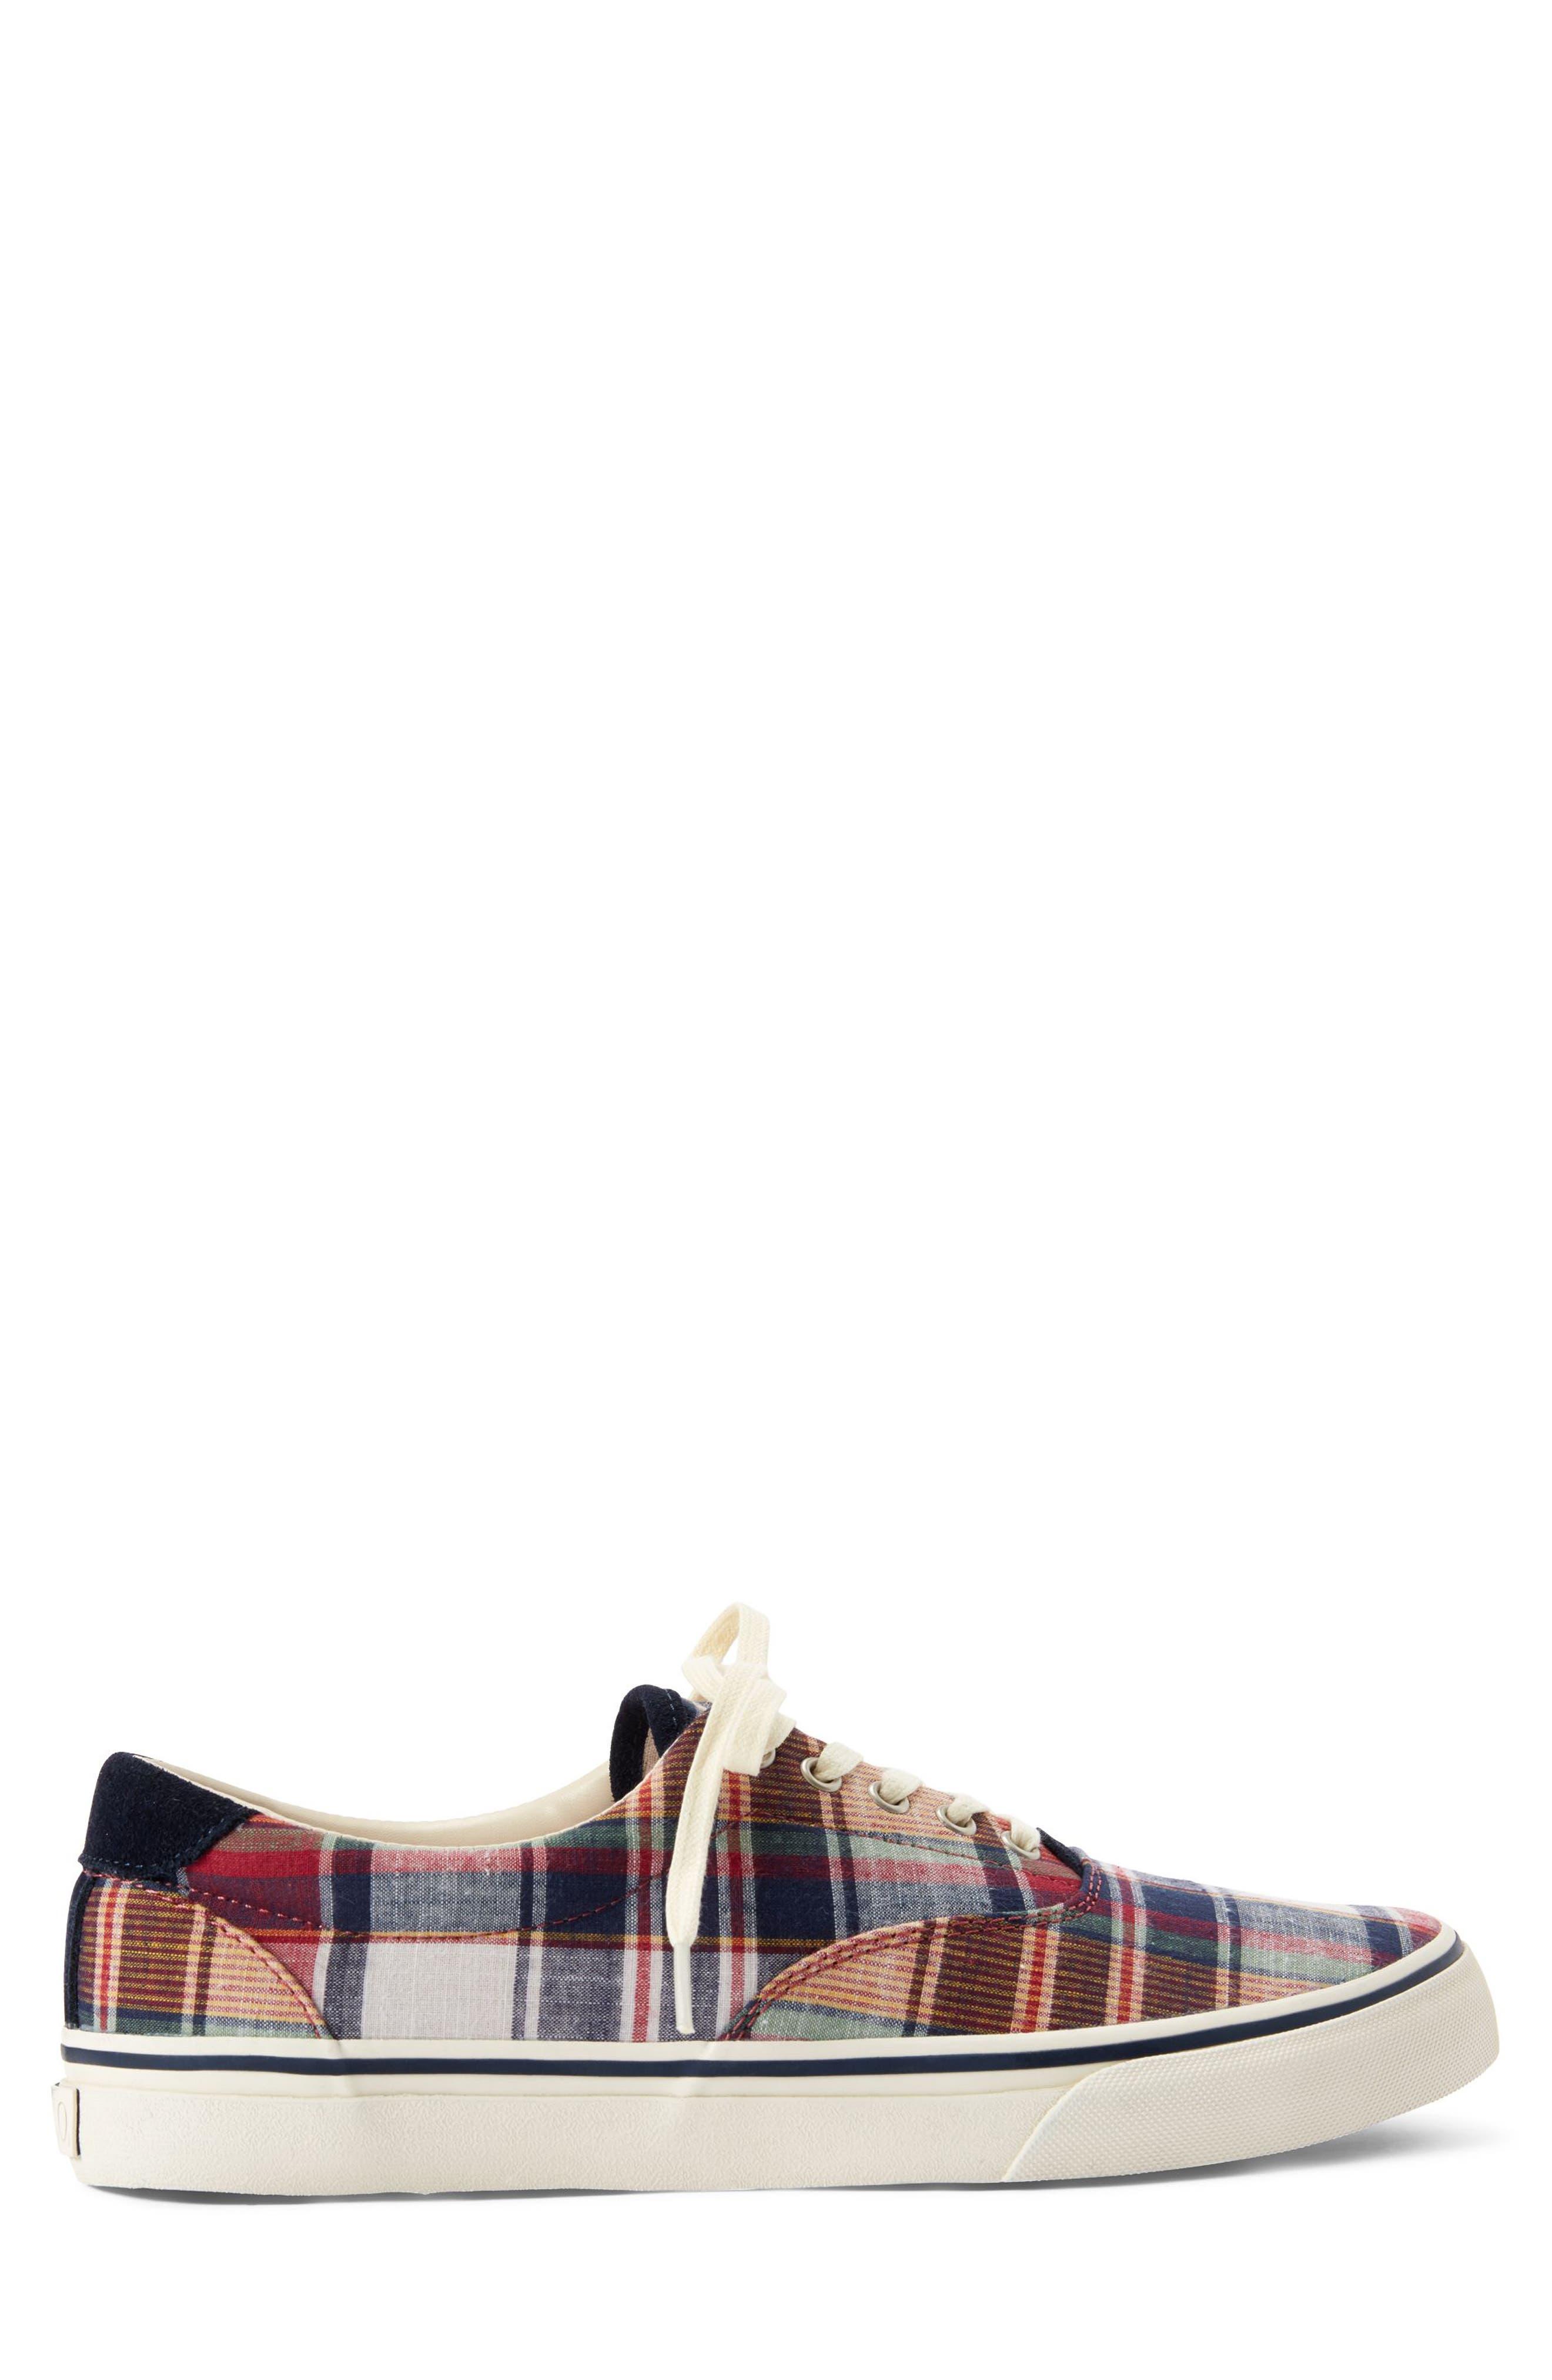 POLO RALPH LAUREN, Thorton III Sneaker, Alternate thumbnail 2, color, MULTI COLOR FABRIC